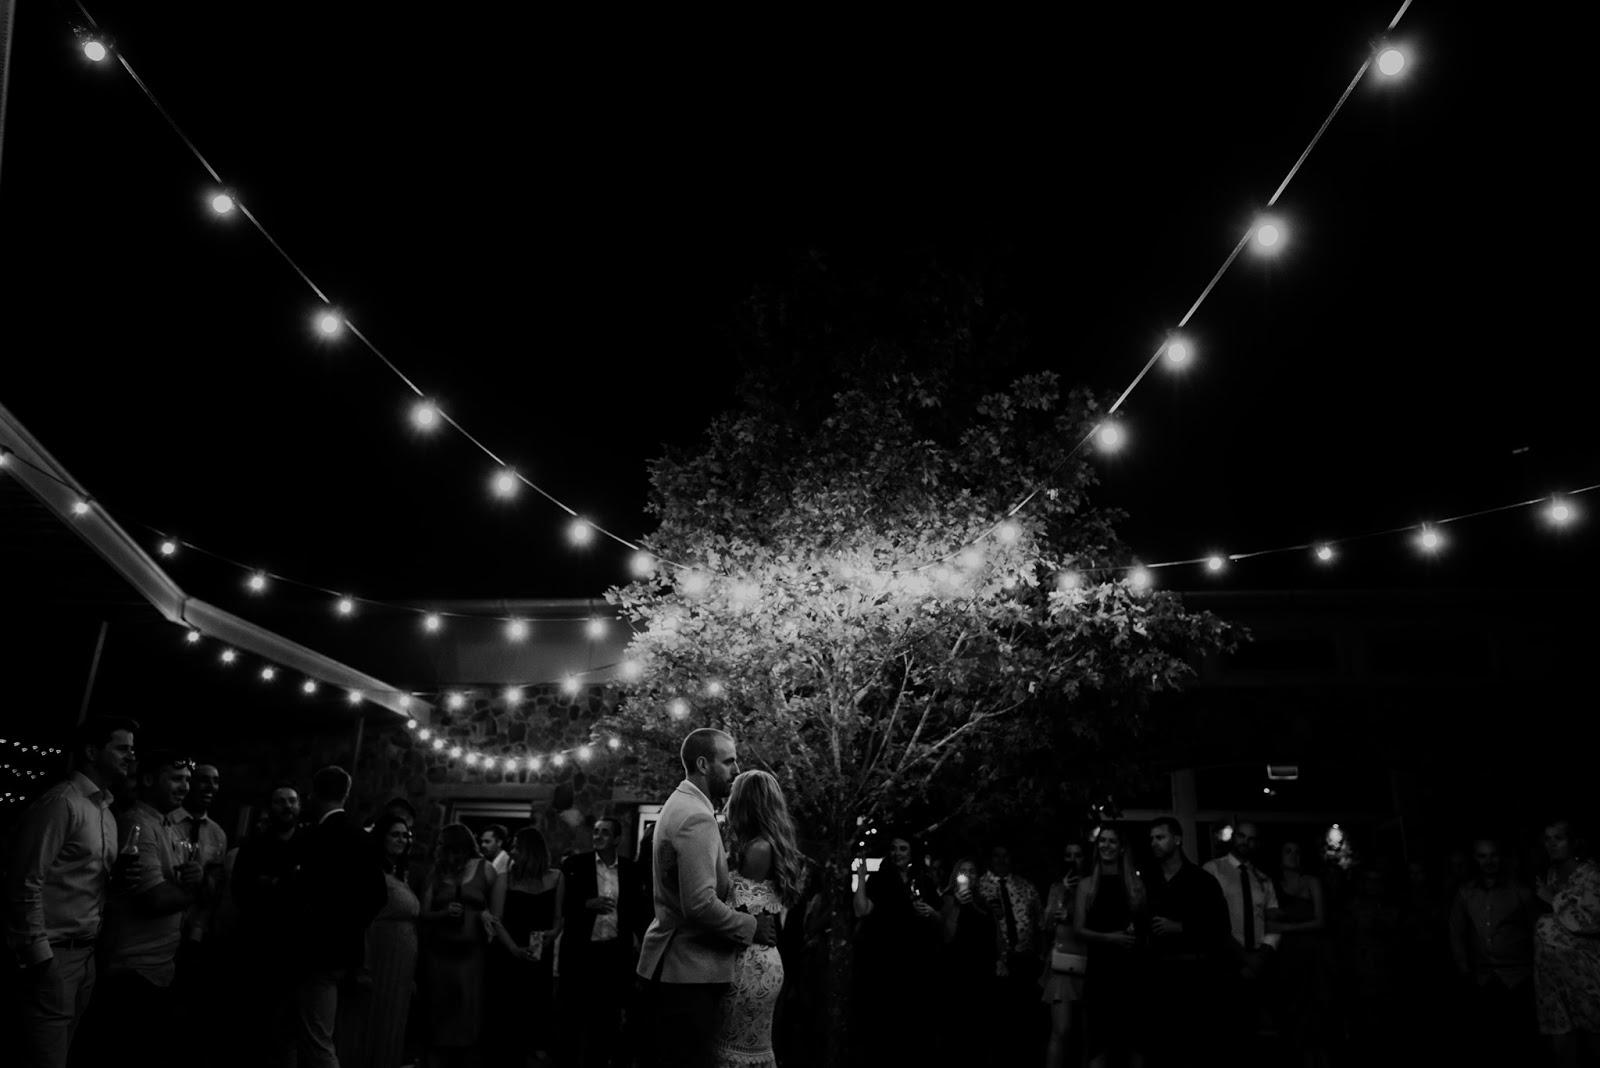 bird and boy photography weddings to the aisle australia venue